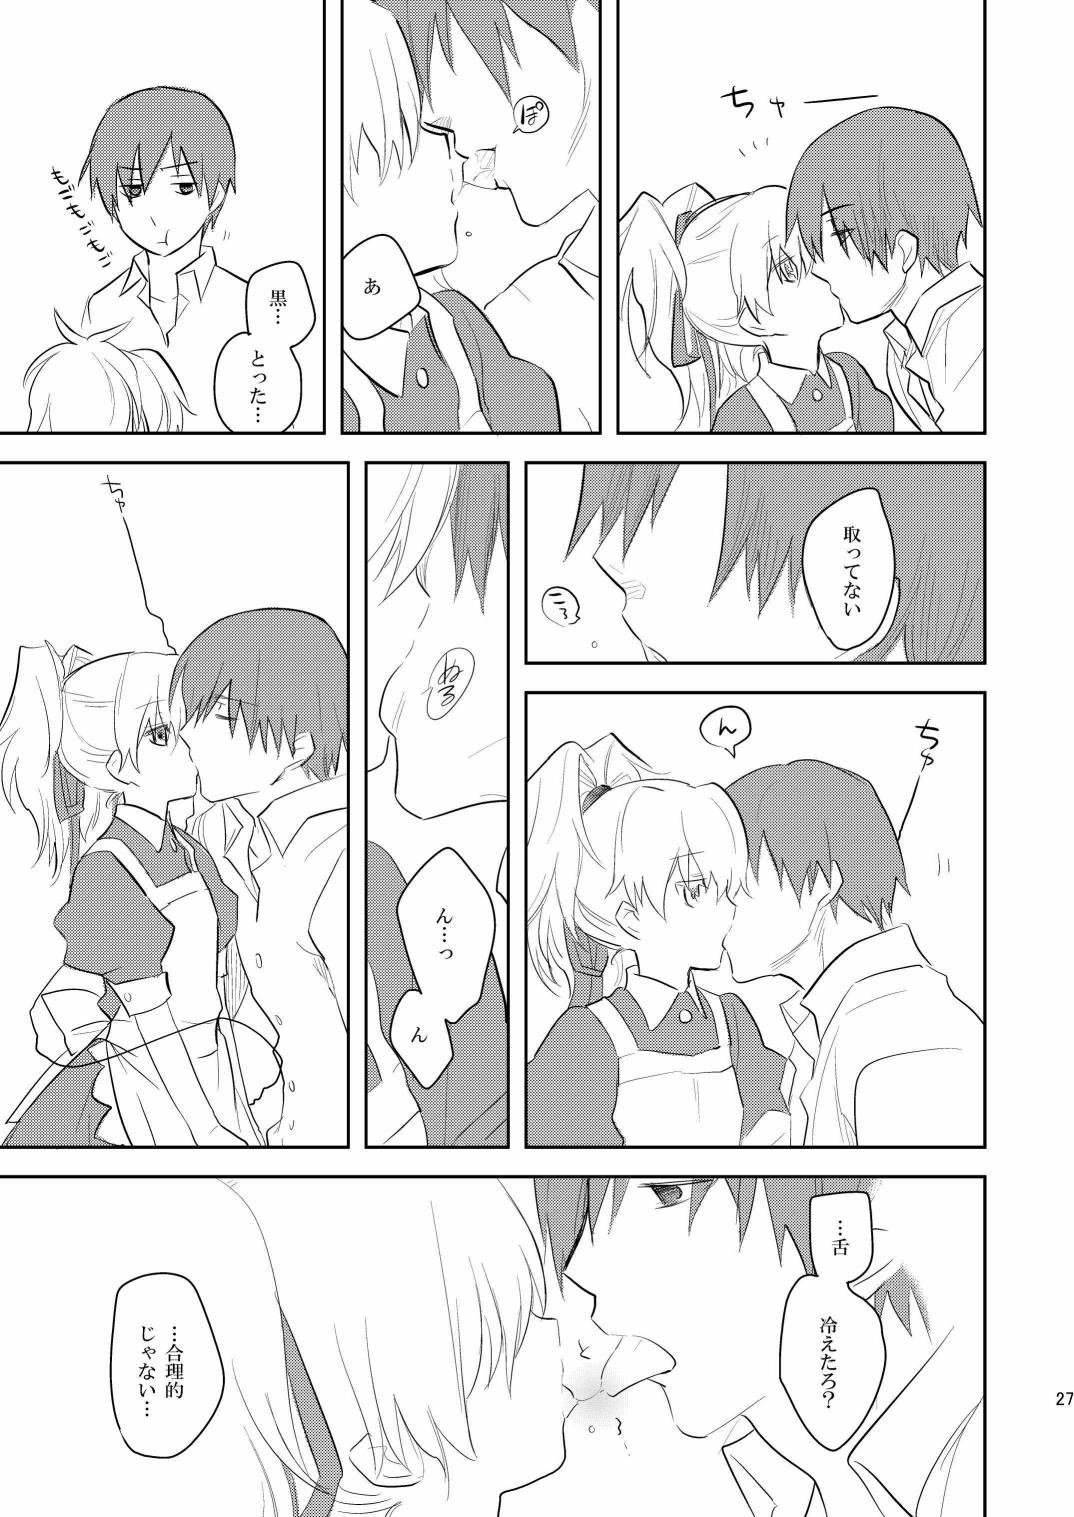 (COMIC1☆4) [AHM (Inu-Blade, Lact Mangan)] Kuroda (Tsuma) Shichihenge (DARKER THAN BLACK) 25